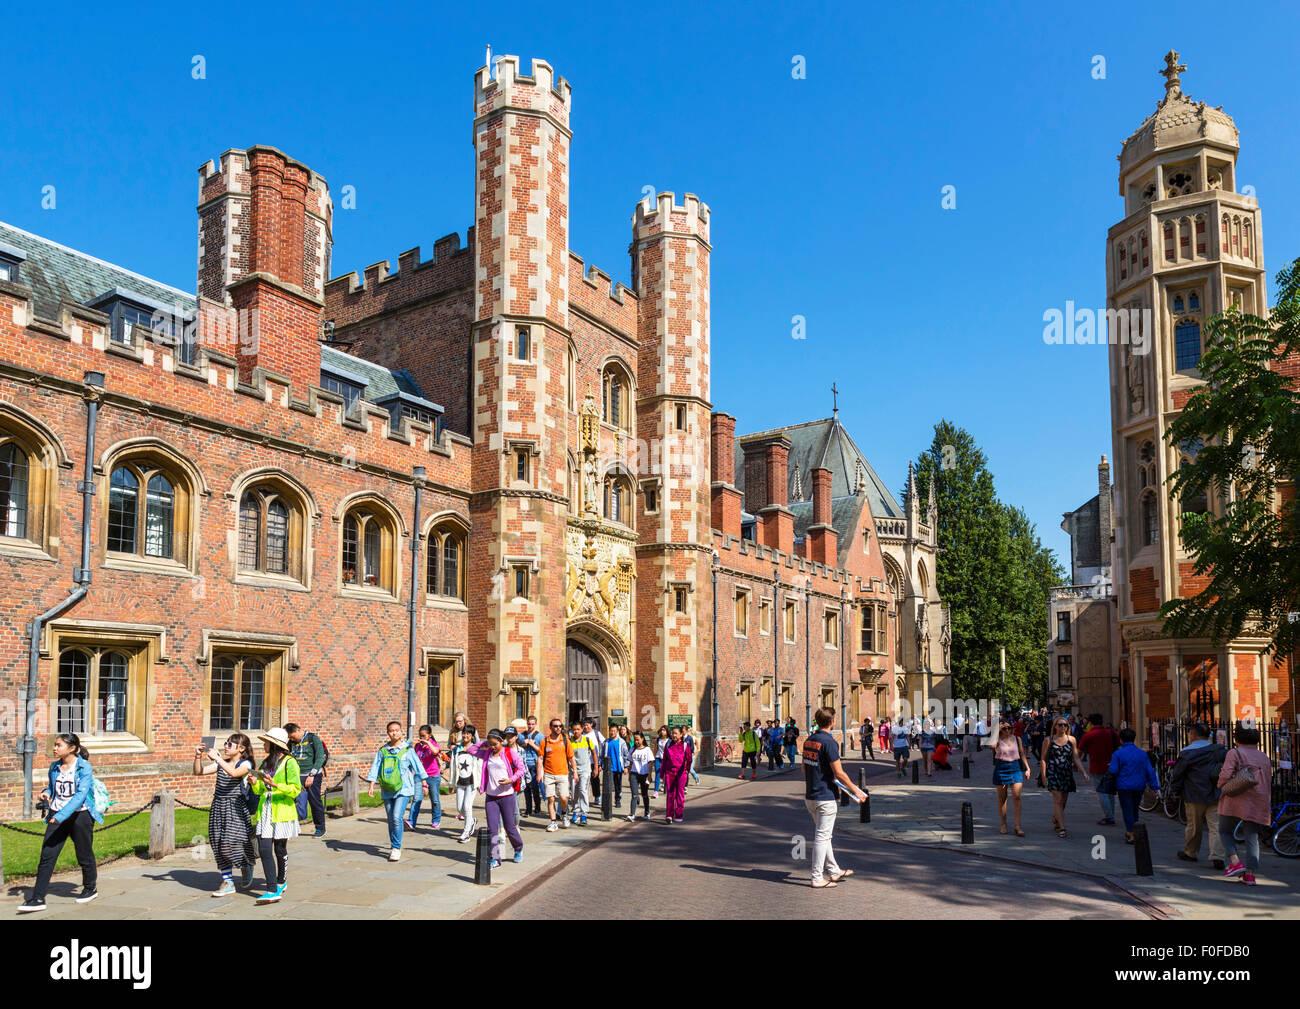 St Johns Street outside St John's College in the city centre, Cambridge, Cambridgeshire, England, UK - Stock Image